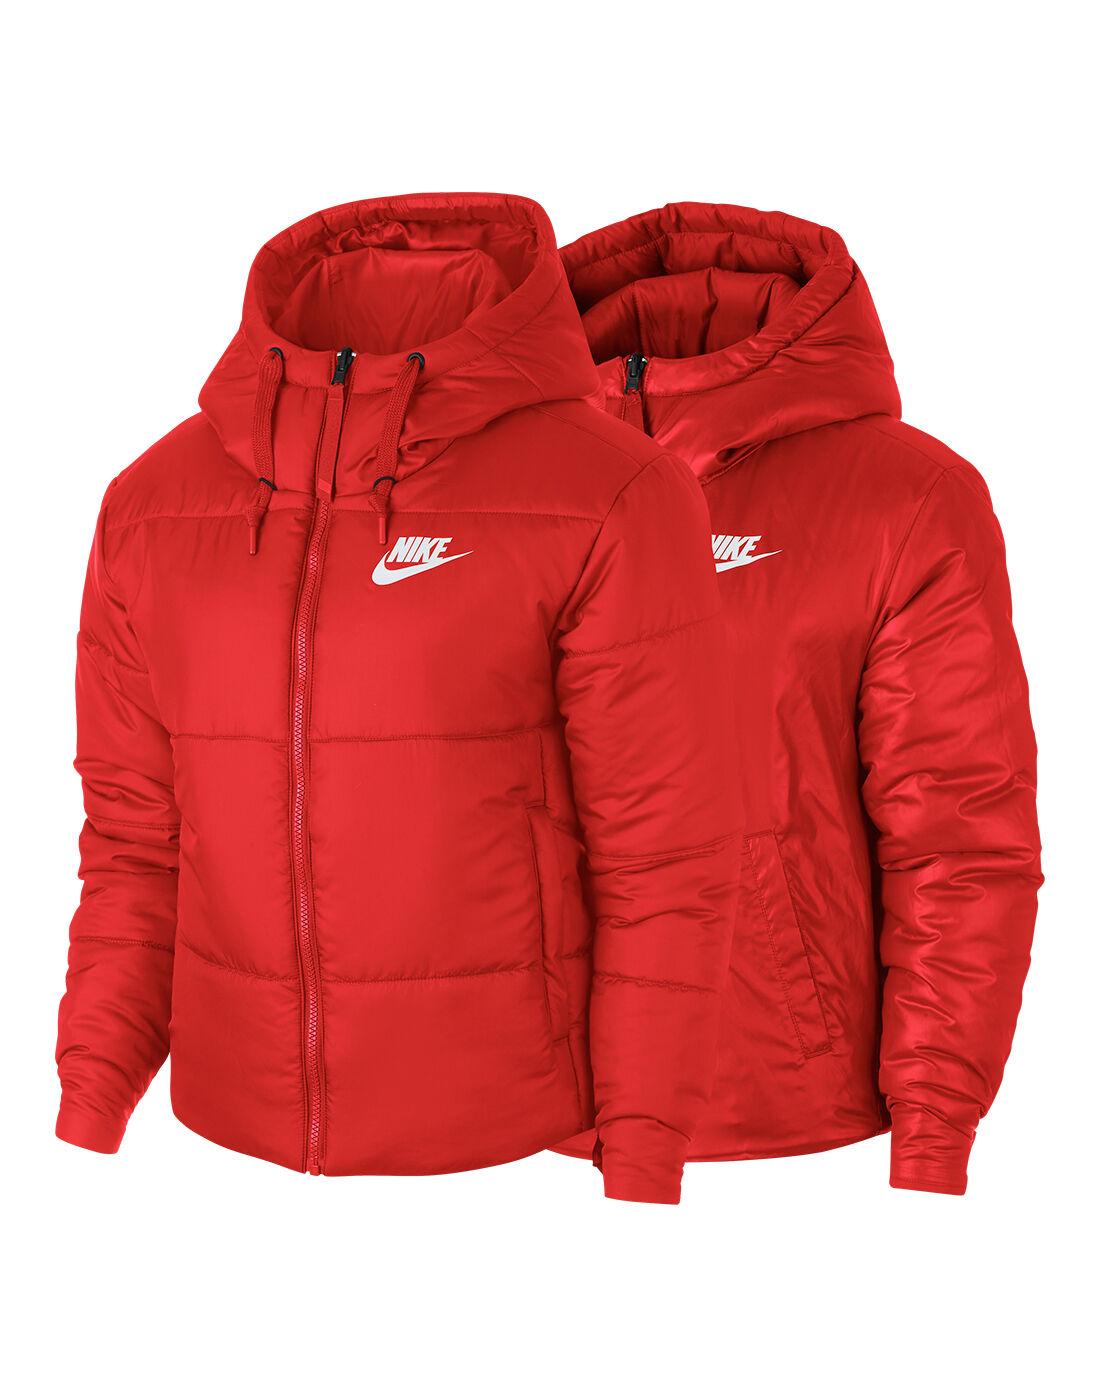 Jackets Women's Life Originals Style Q7cgrcxw Nike Adidas Sports 6qxaadfw